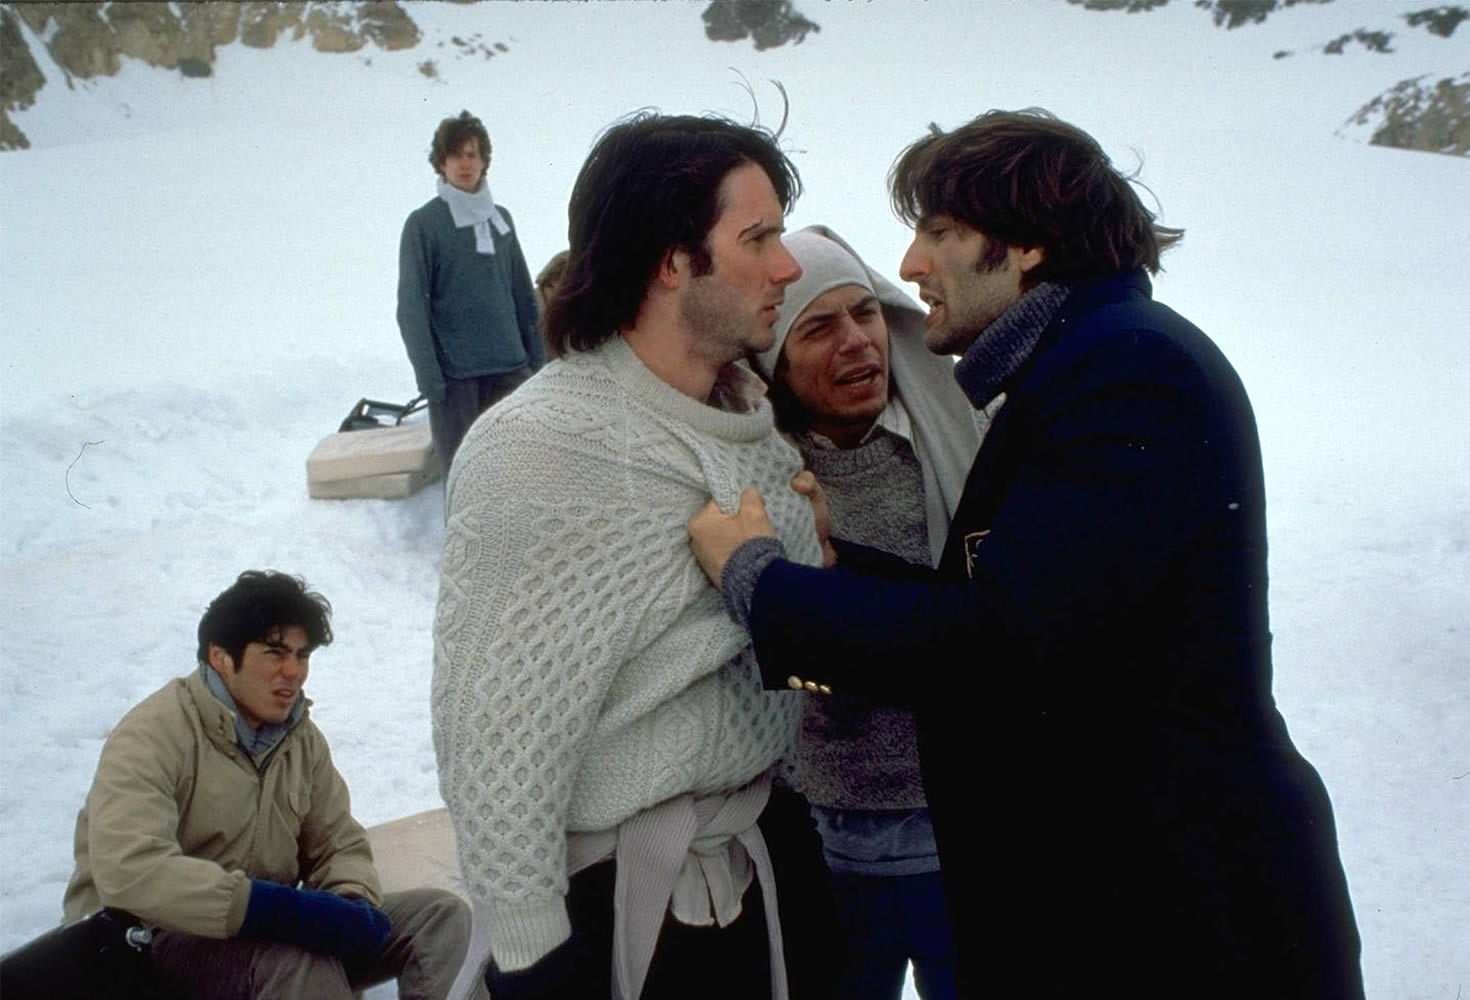 plane survivors argue in alive movie